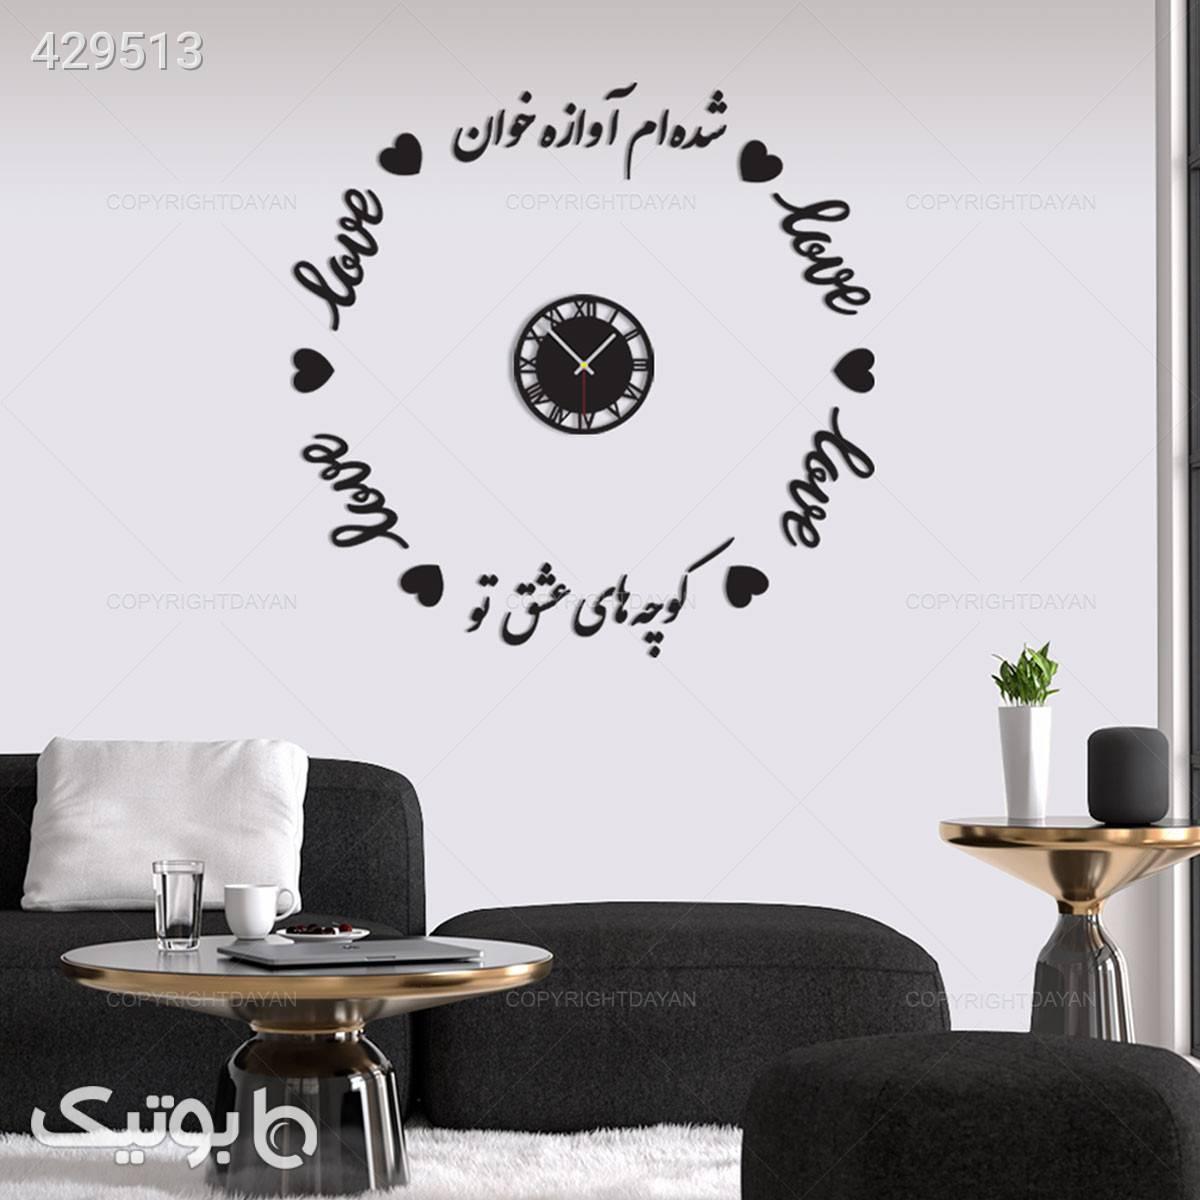 ساعت دیواری Romance مدل 12544 مشکی ساعت